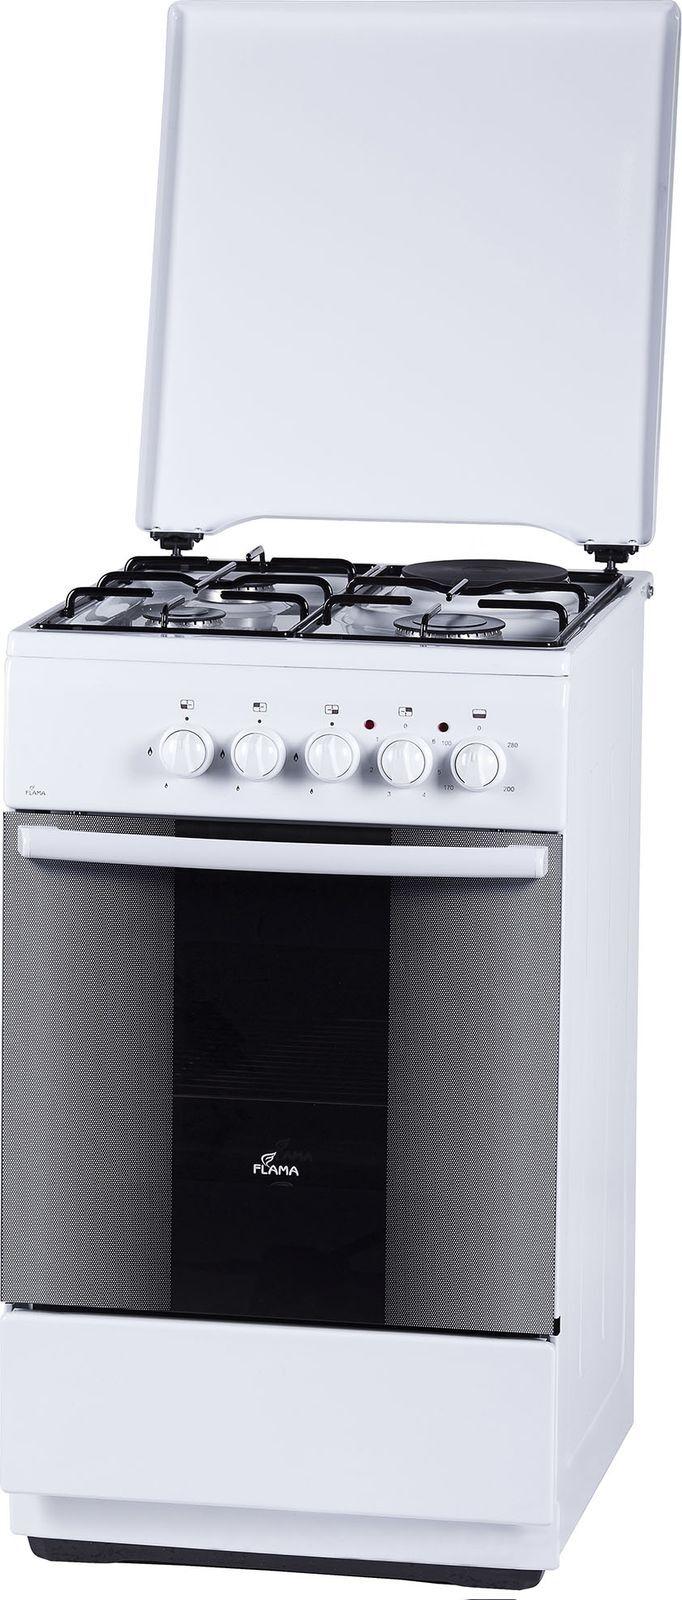 Кухонная плита Flama RK 23-105 W, белый